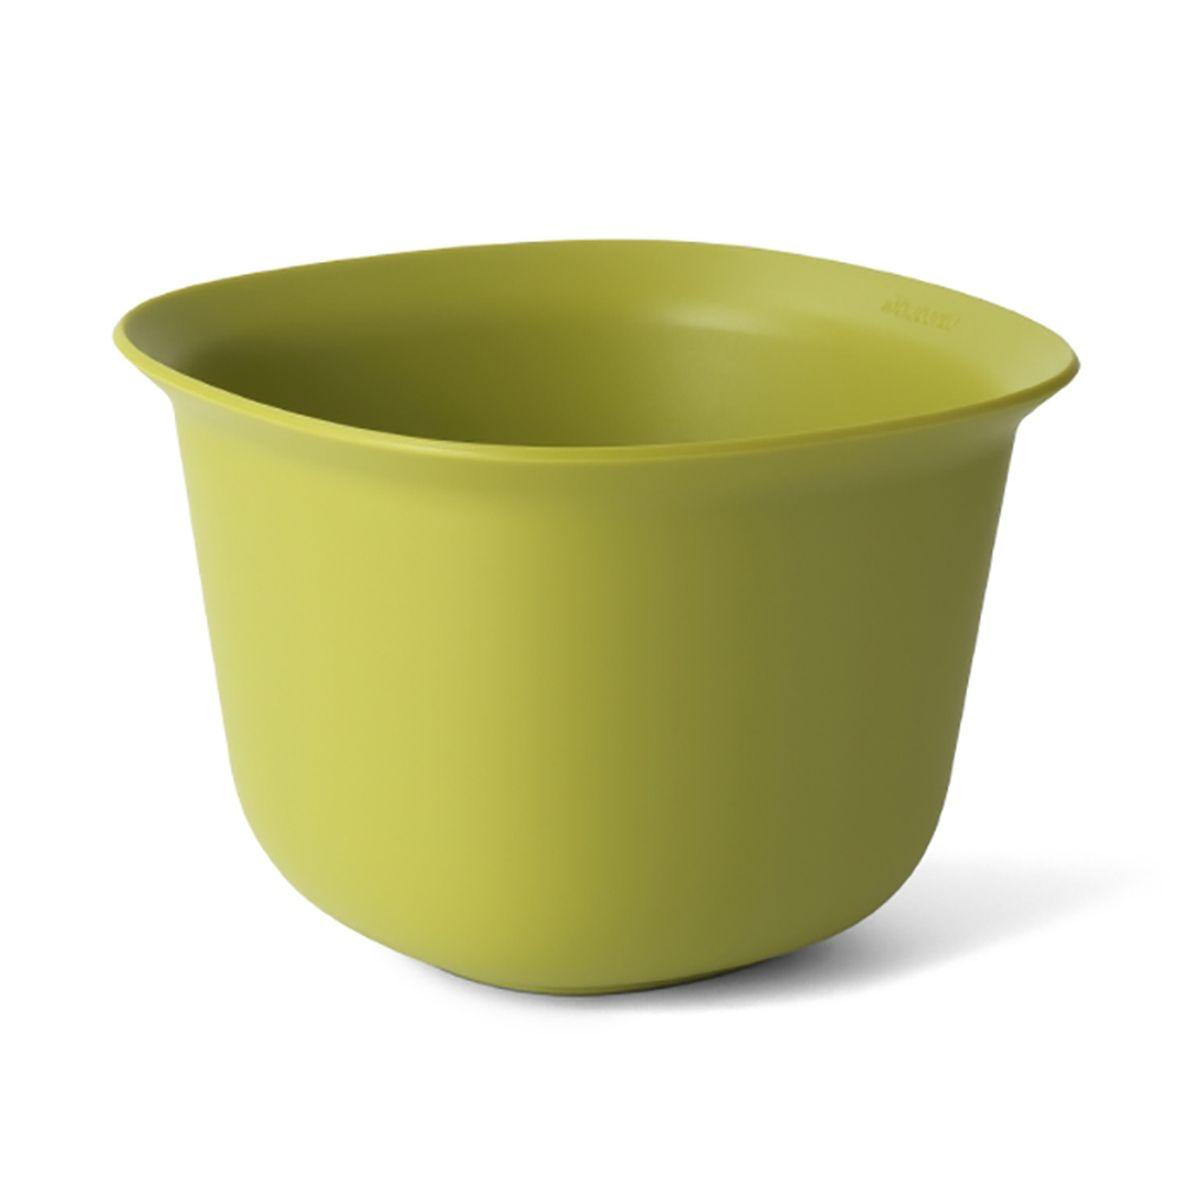 "Салатник Brabantia ""Tasty Colours"", цвет: зеленый, 1,5 л. 110009"